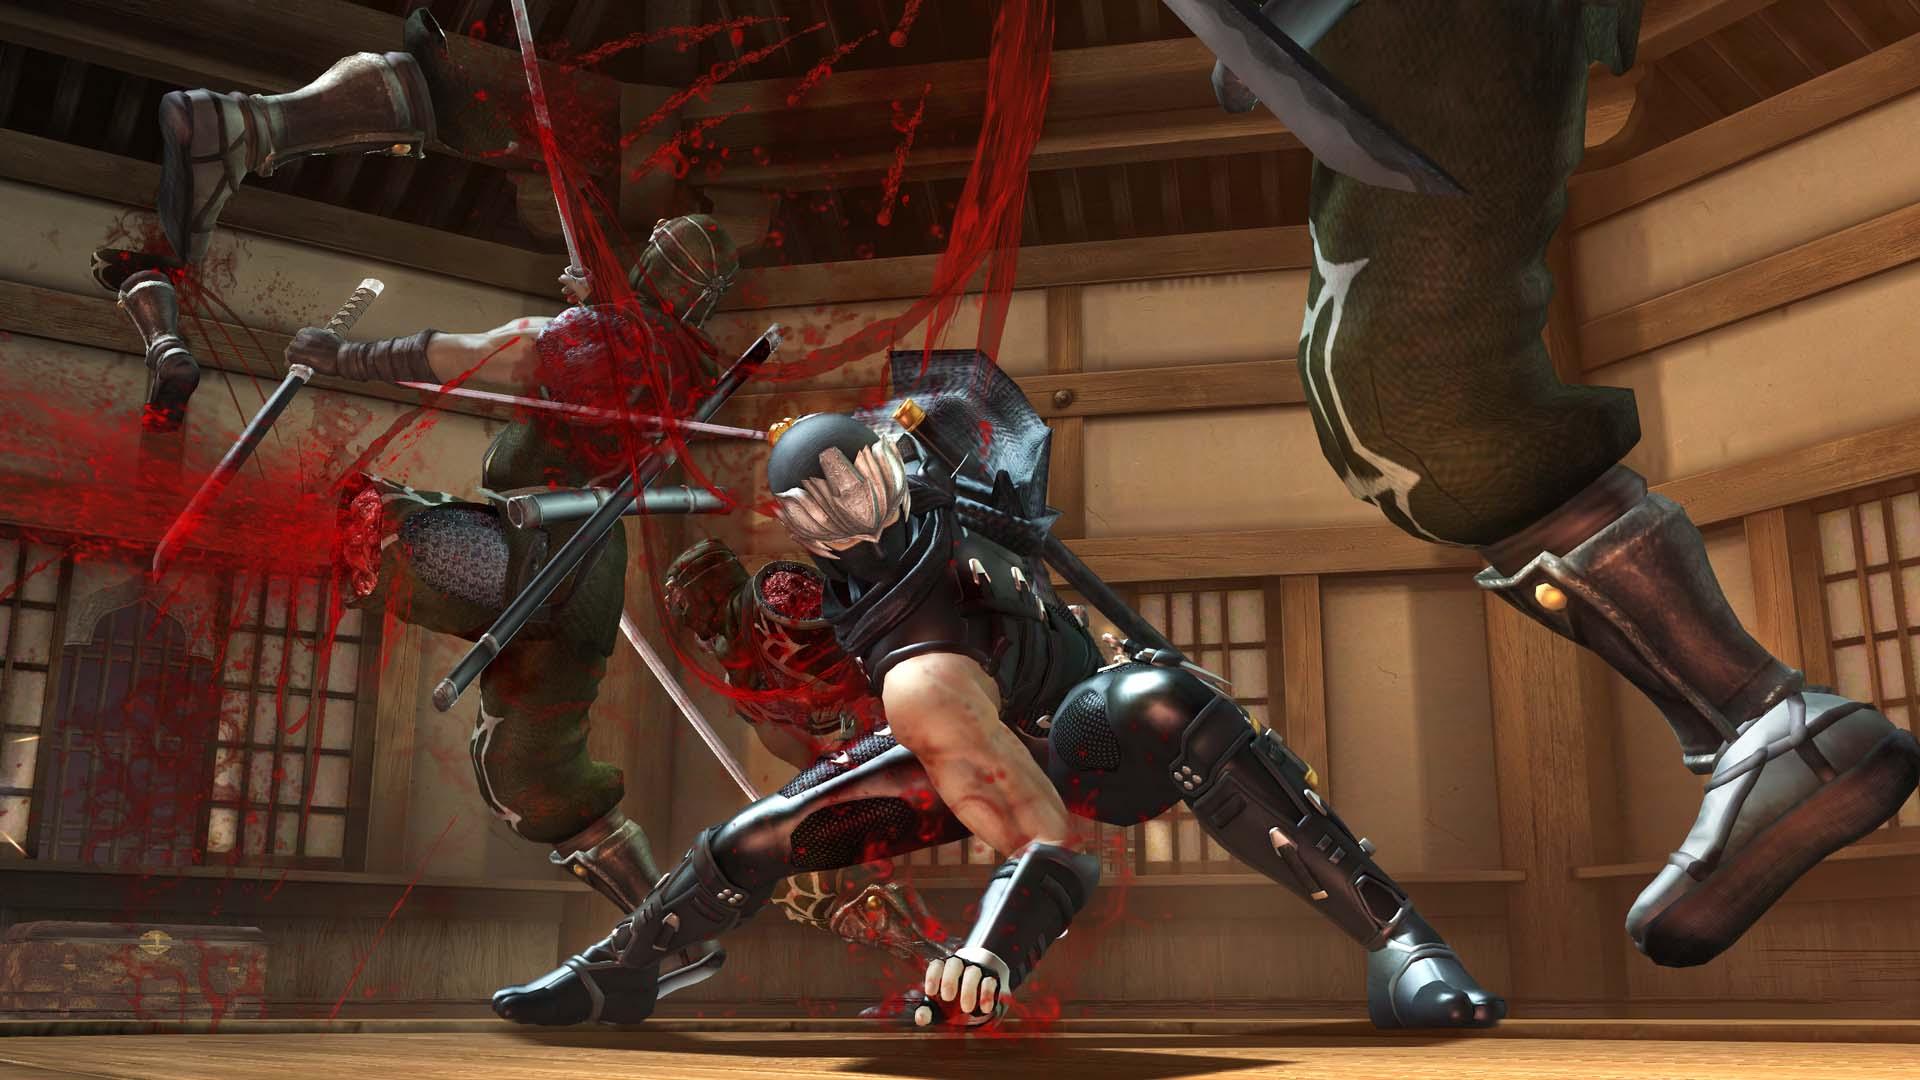 Ninja Gaiden III Will Include Easier 'Hero Mode' For Story